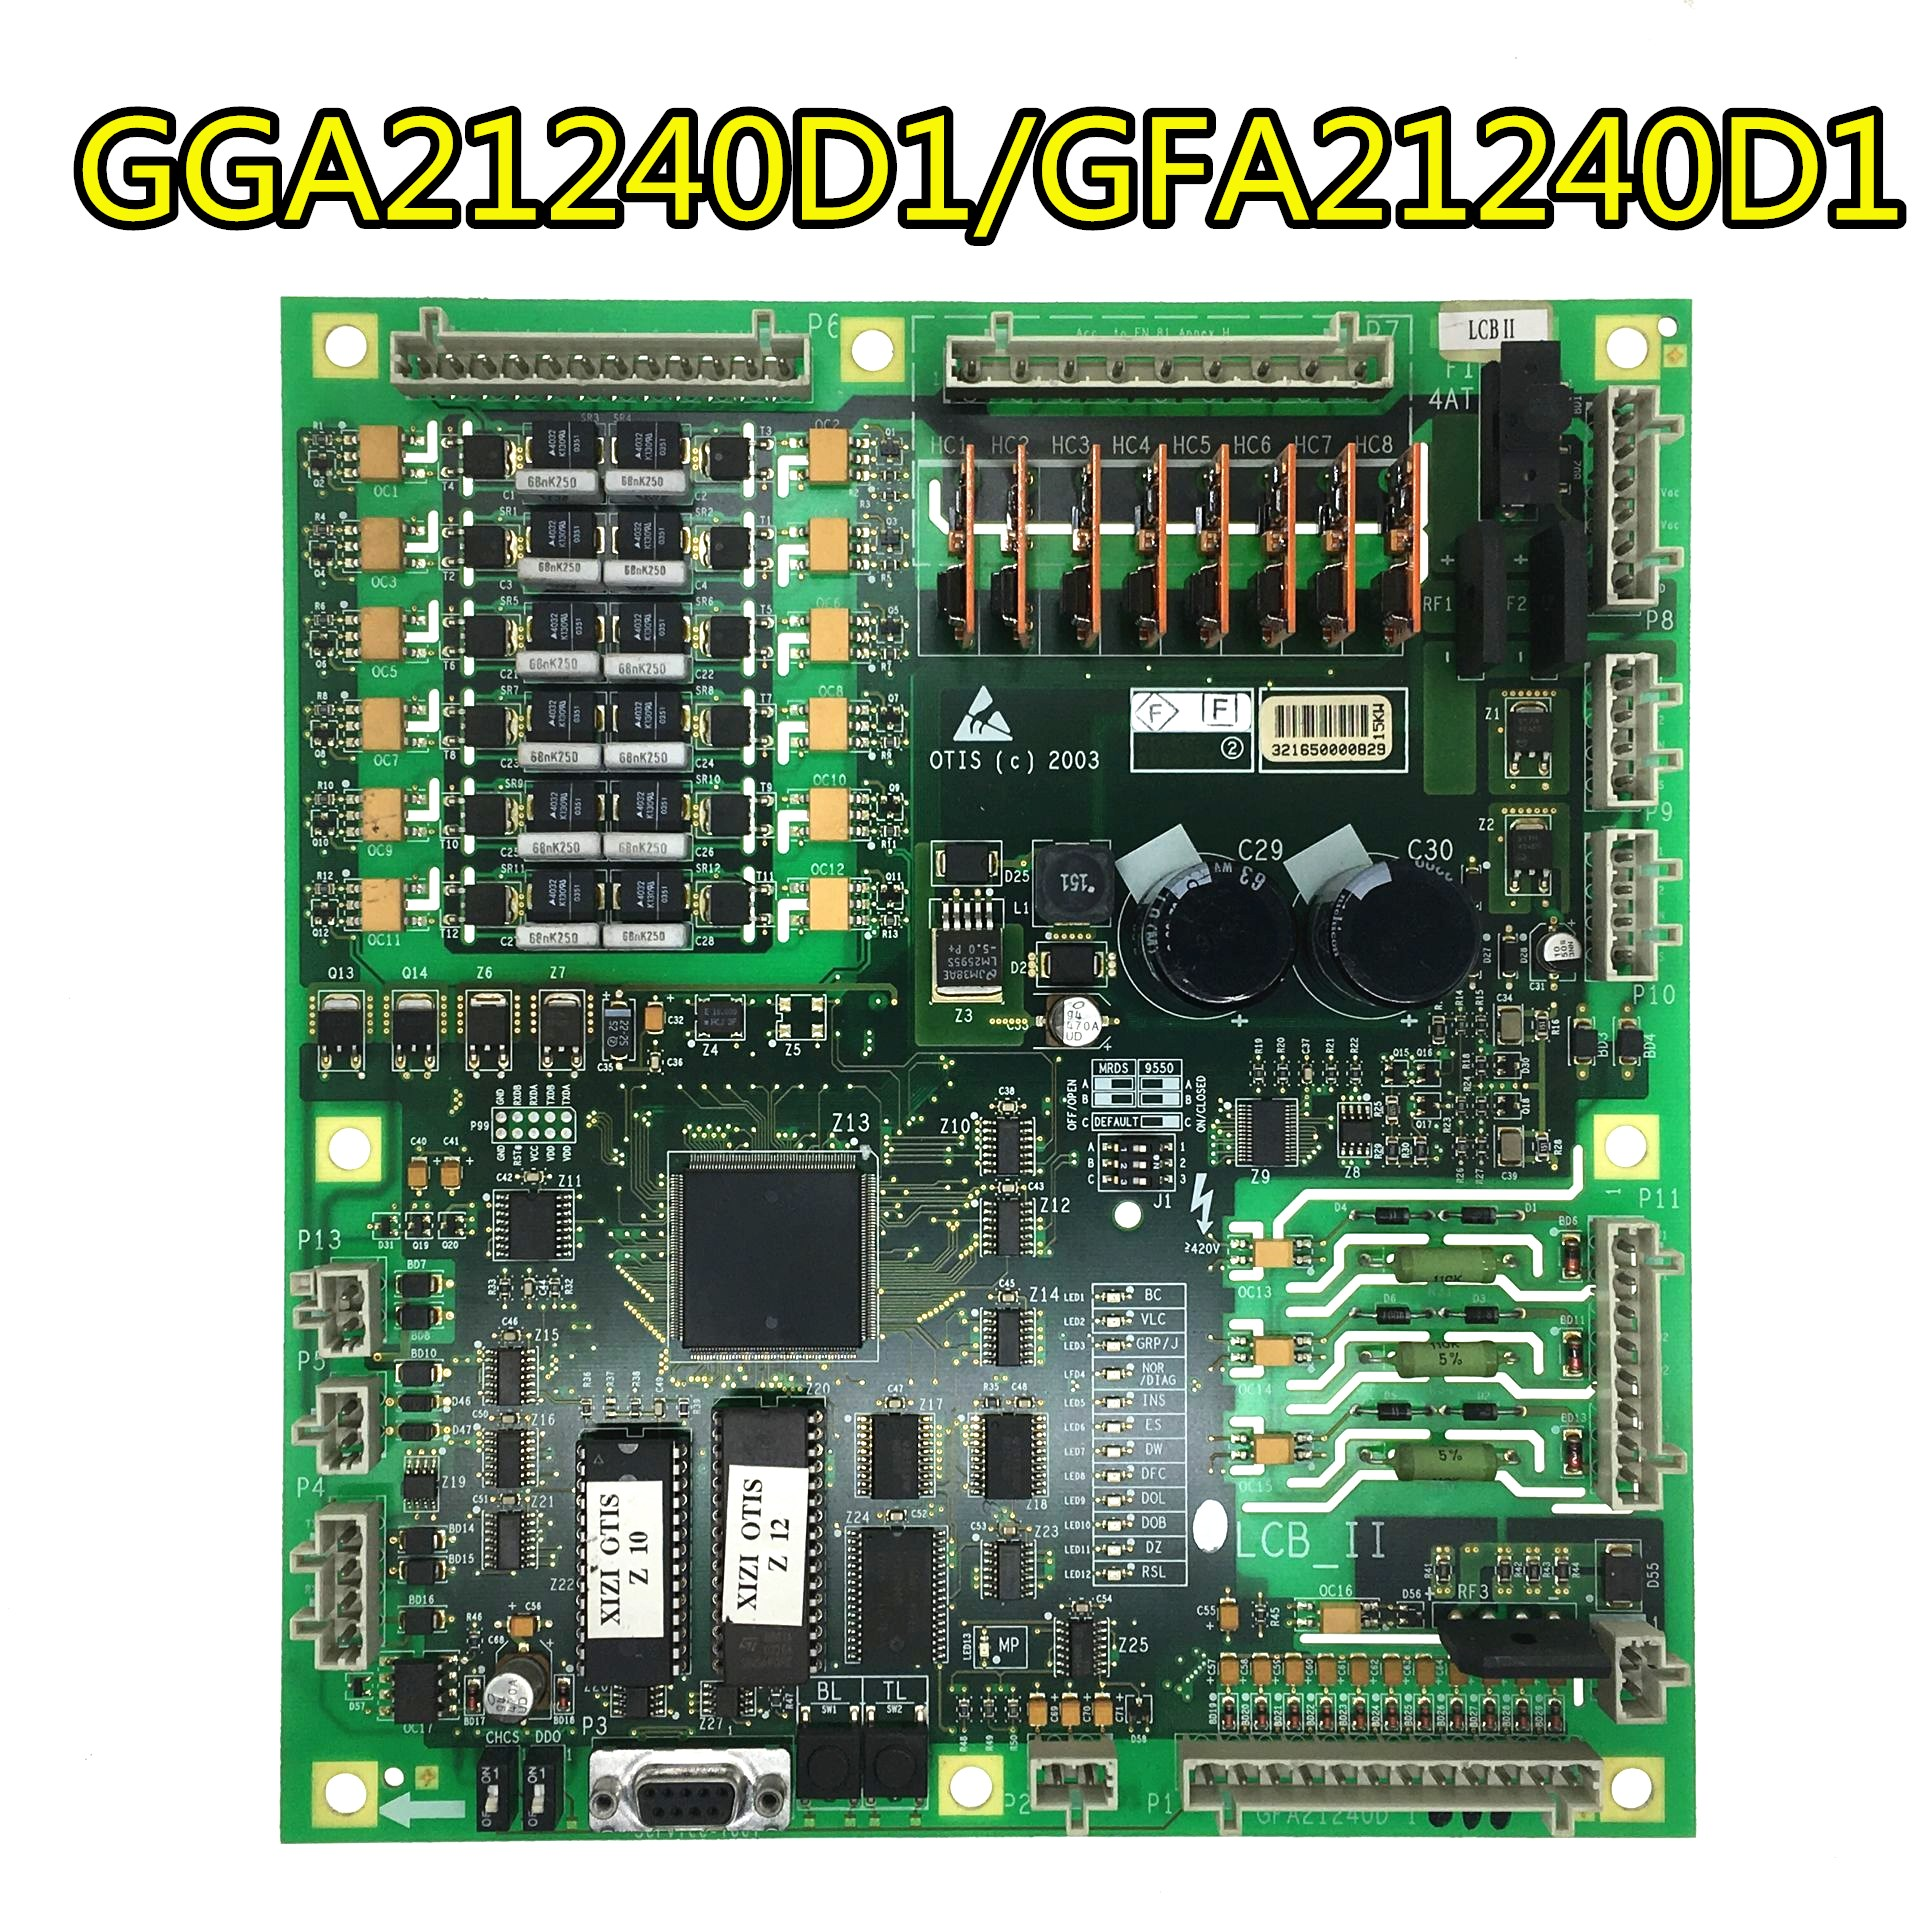 Disponível para Gga21240d1 Está Gfa21240d1